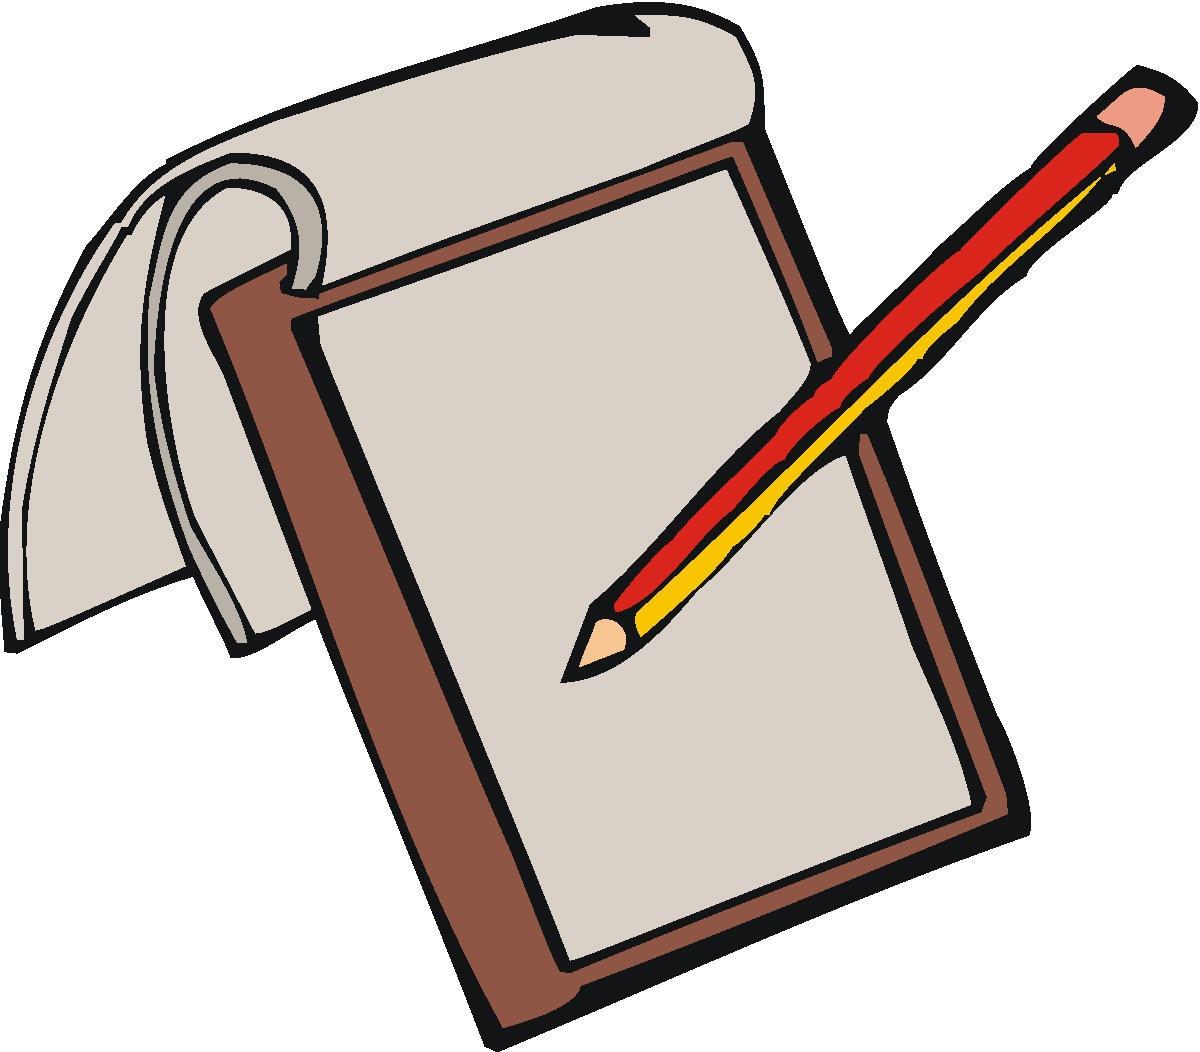 Pencil And Paper Writing .-Pencil And Paper Writing .-19